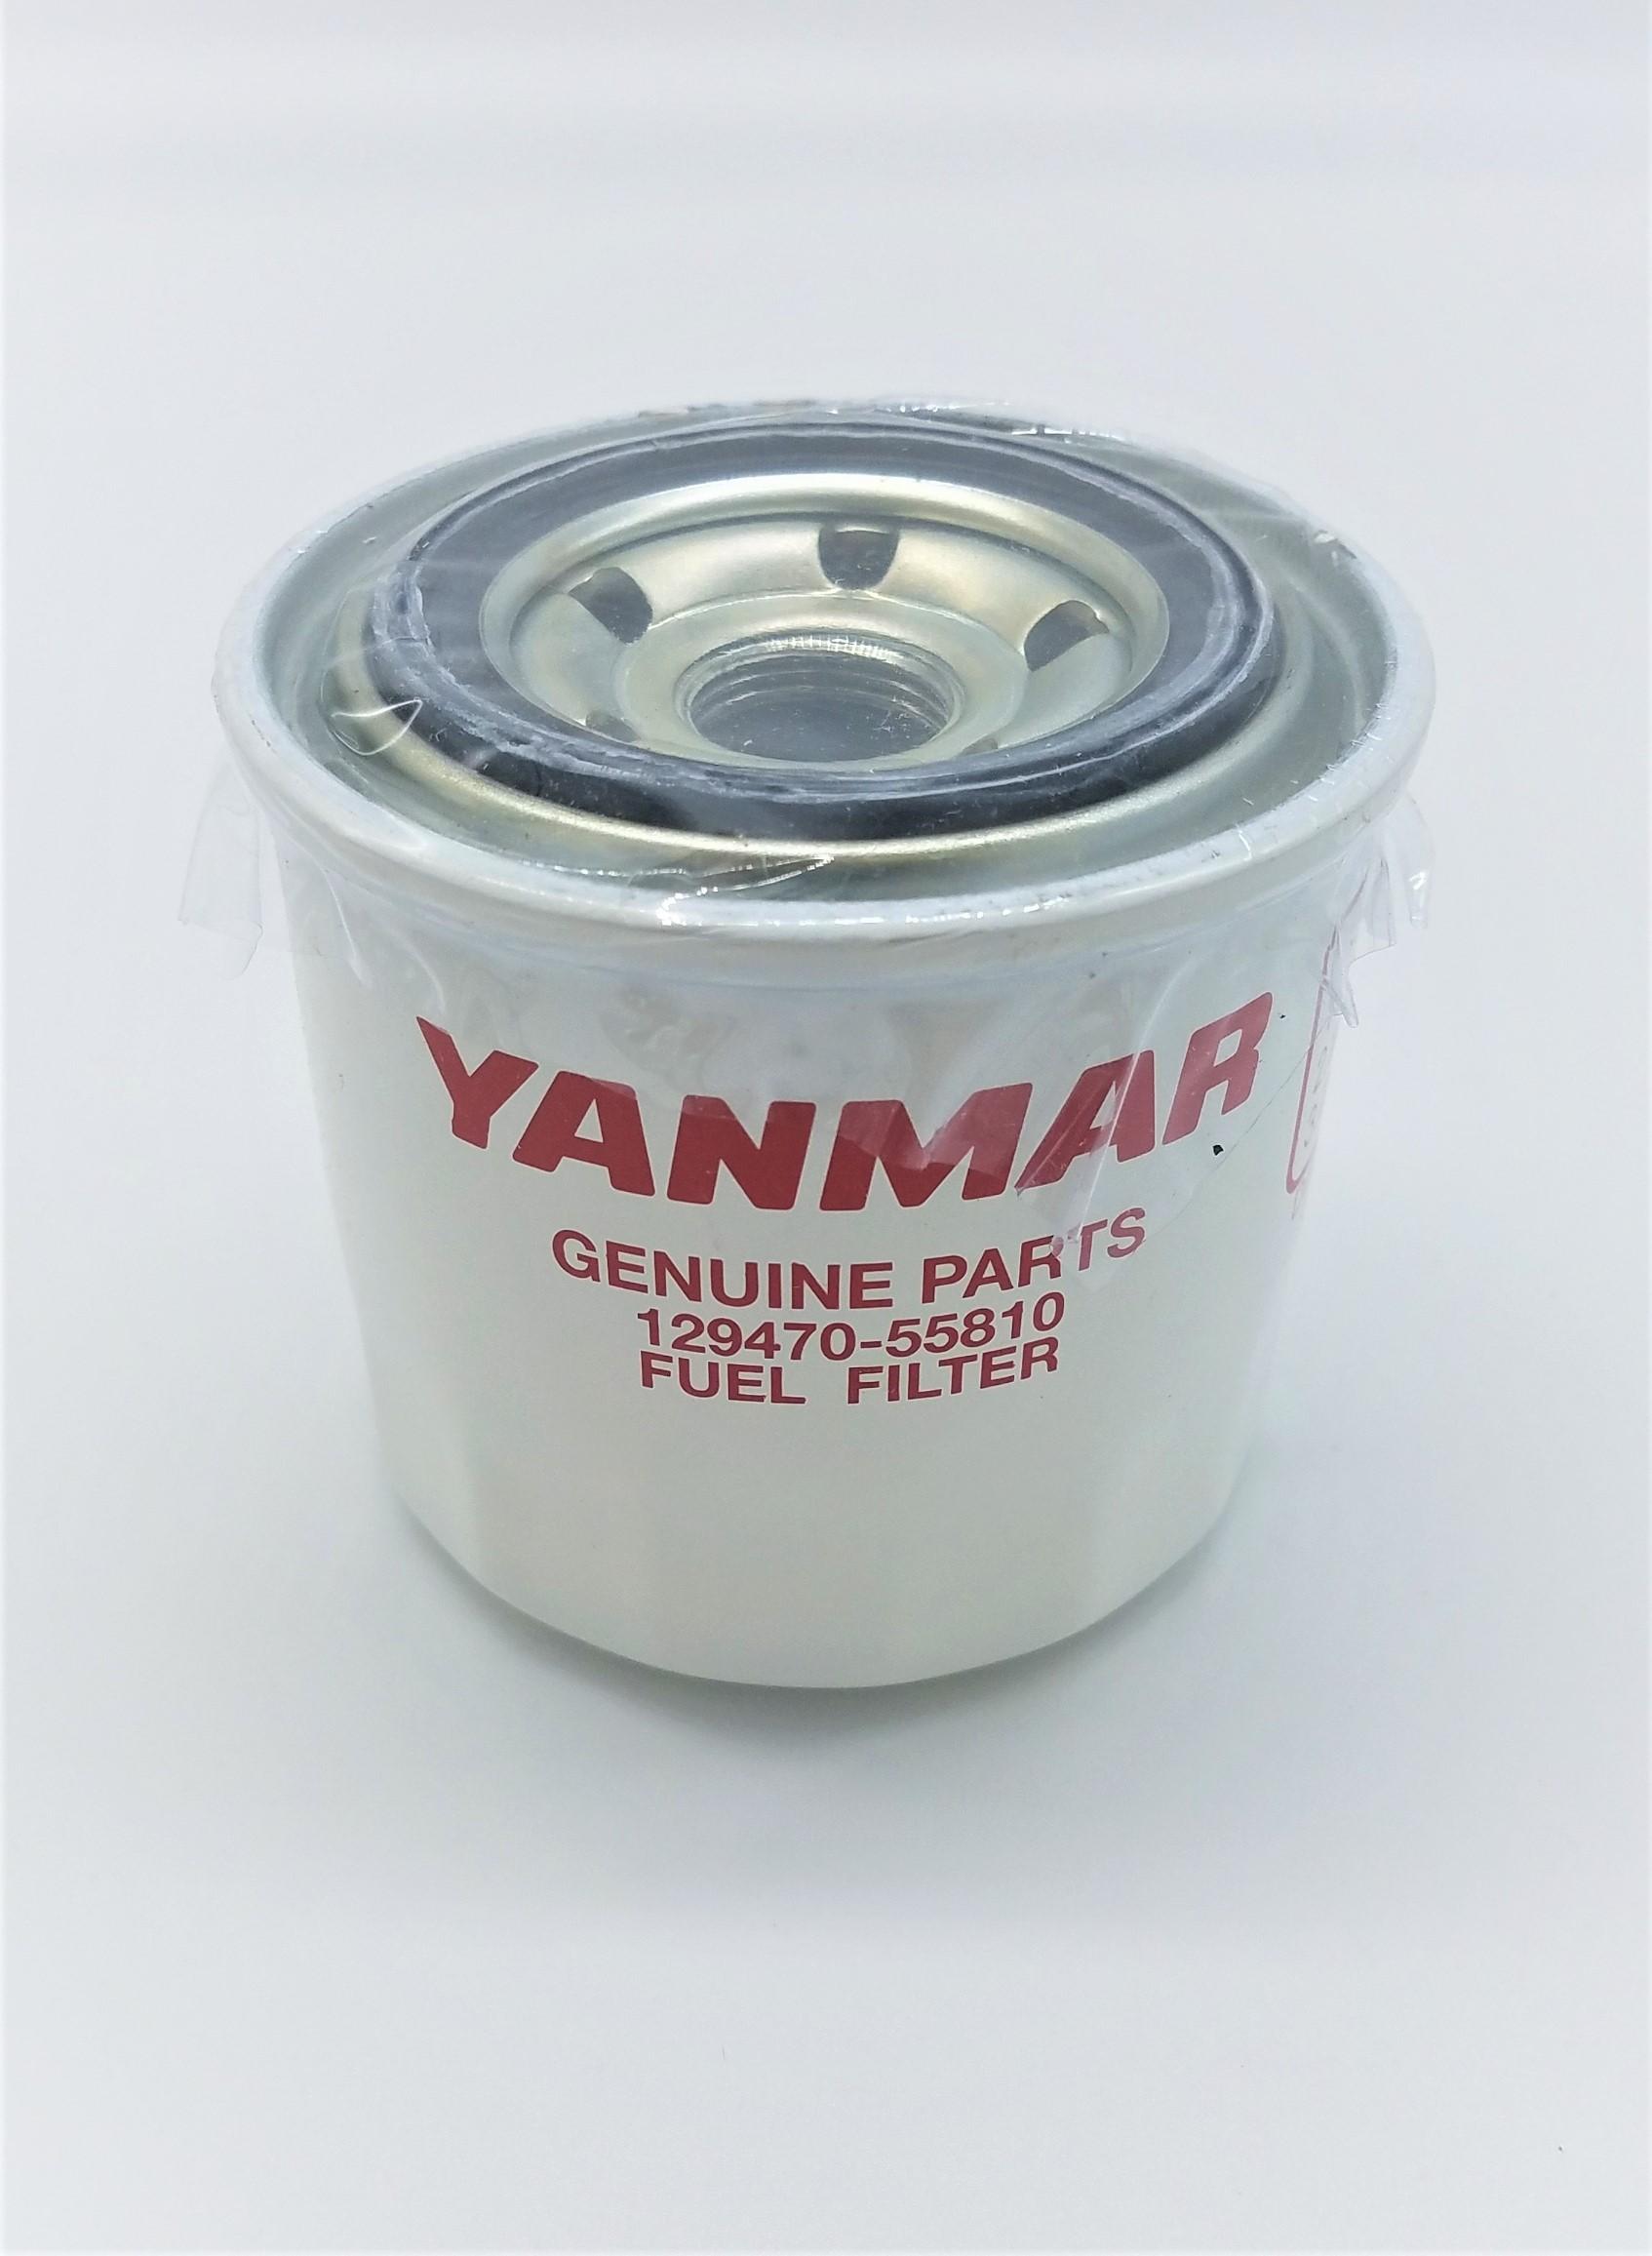 Yanmar 119770-90620 Oil Filter 119770-90620-12 Genuine Parts OEM